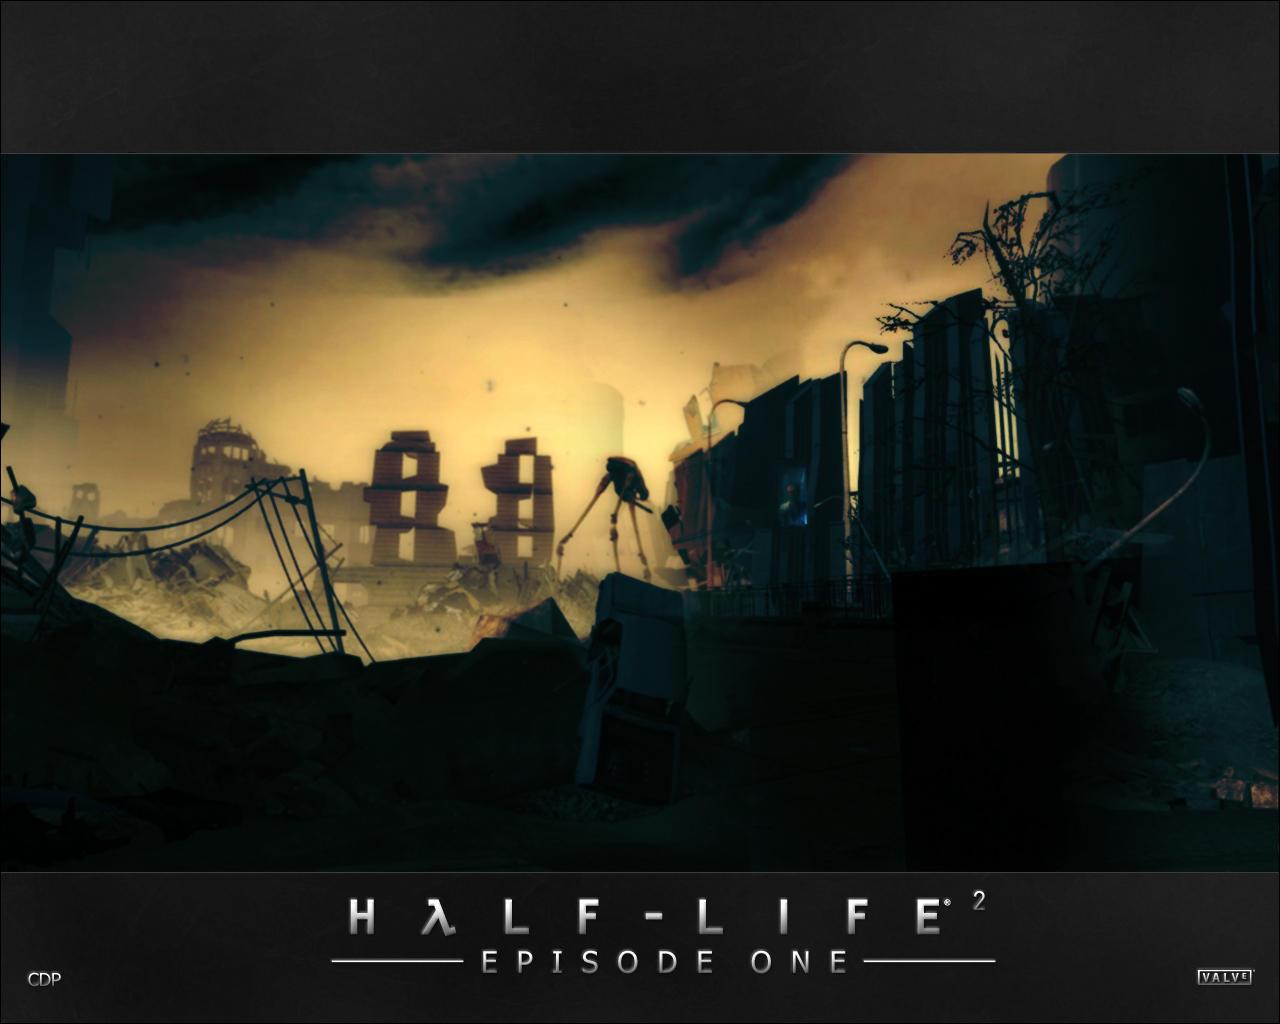 Half life 2 episode two wallpaper / Seiko ladies watch black dial